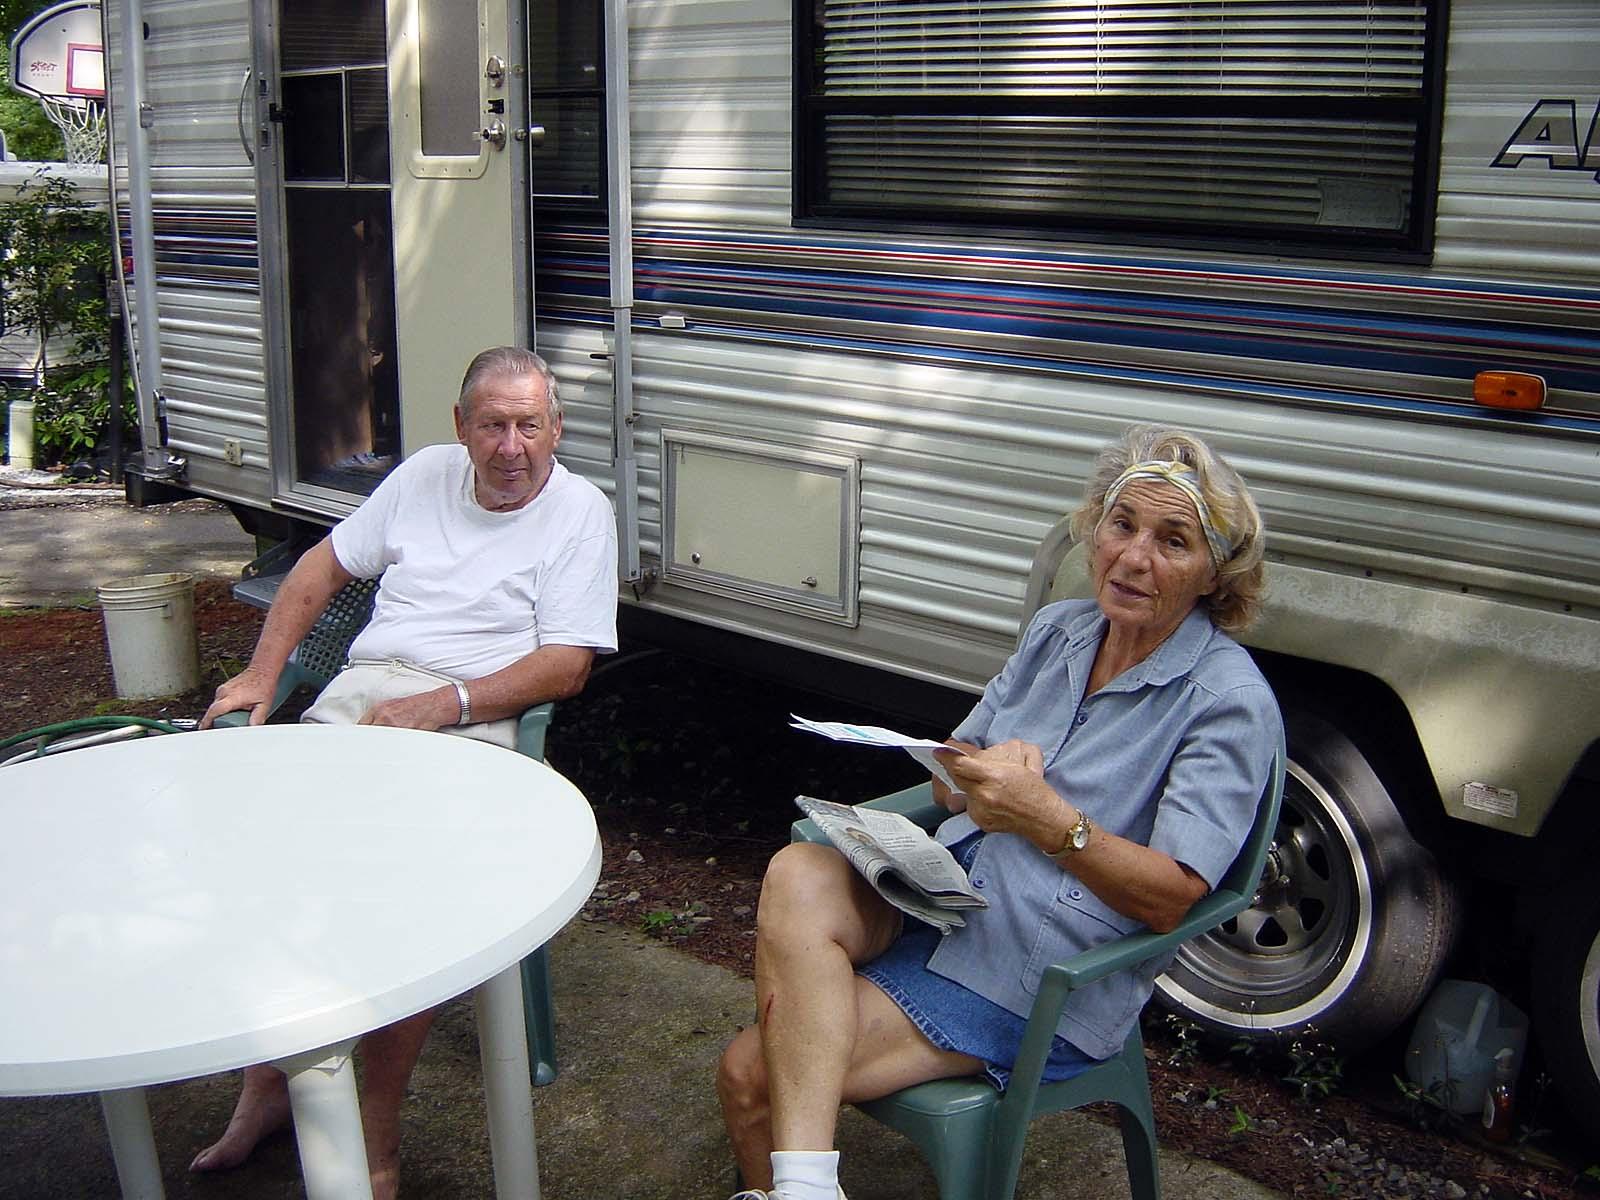 Mountain Lakes - unsere Freunde Ludmilla und Gene aus Sarasota